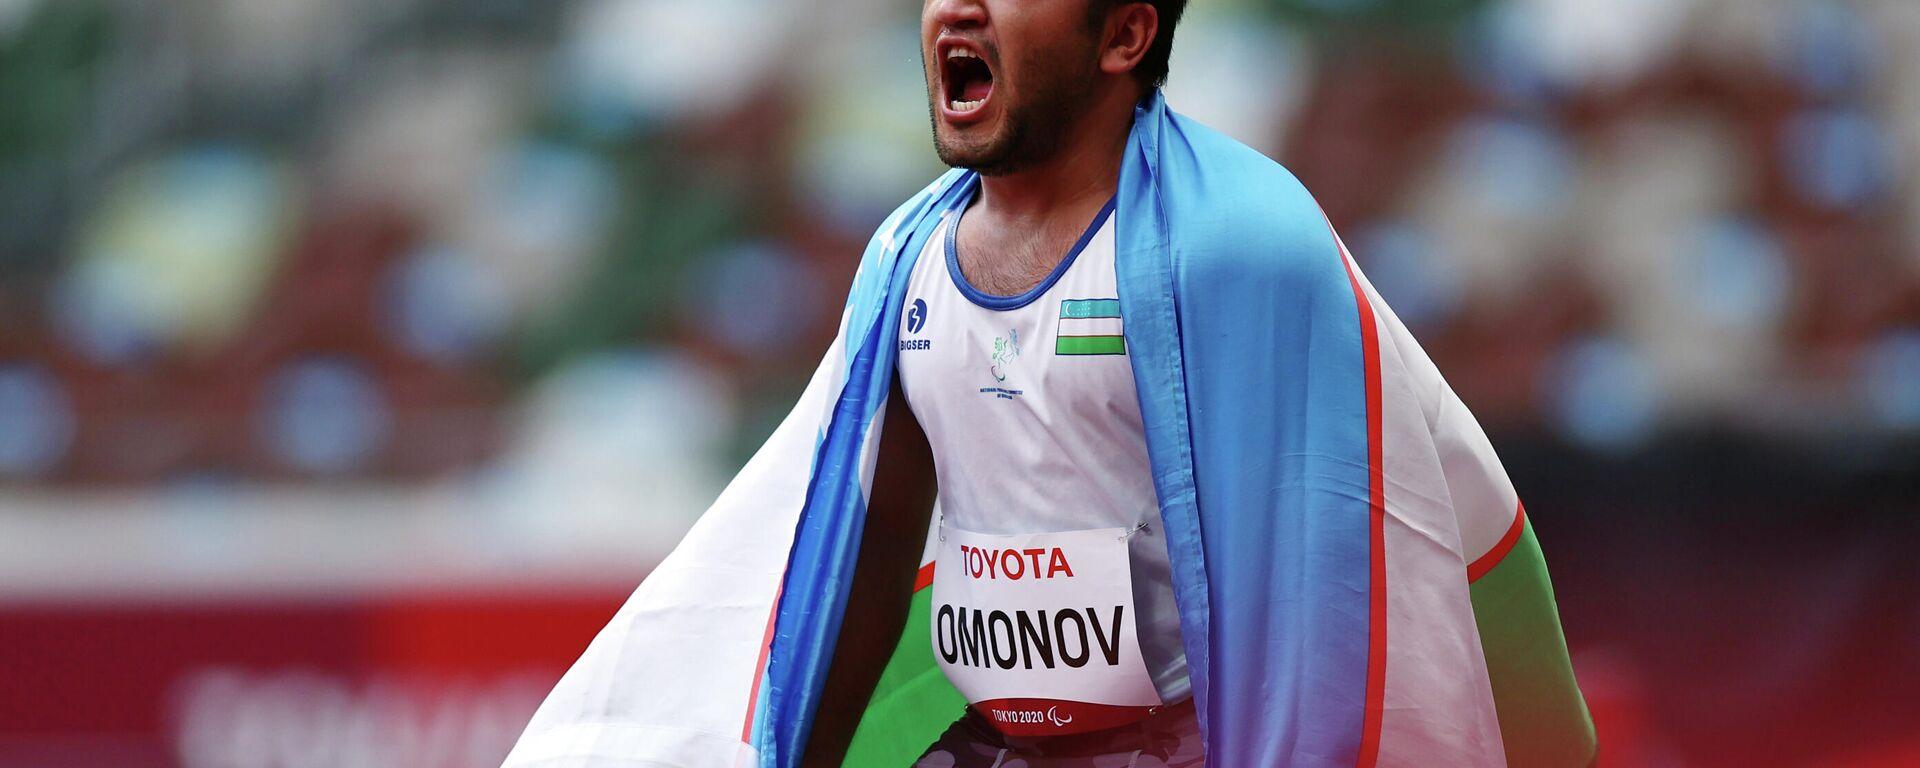 Bobirjon Omonov of Uzbekistan reacts after winning gold and setting a new Paralympic record with the flag of Uzbekistan REUTERS/Athit Perawongmetha - Sputnik Ўзбекистон, 1920, 05.09.2021